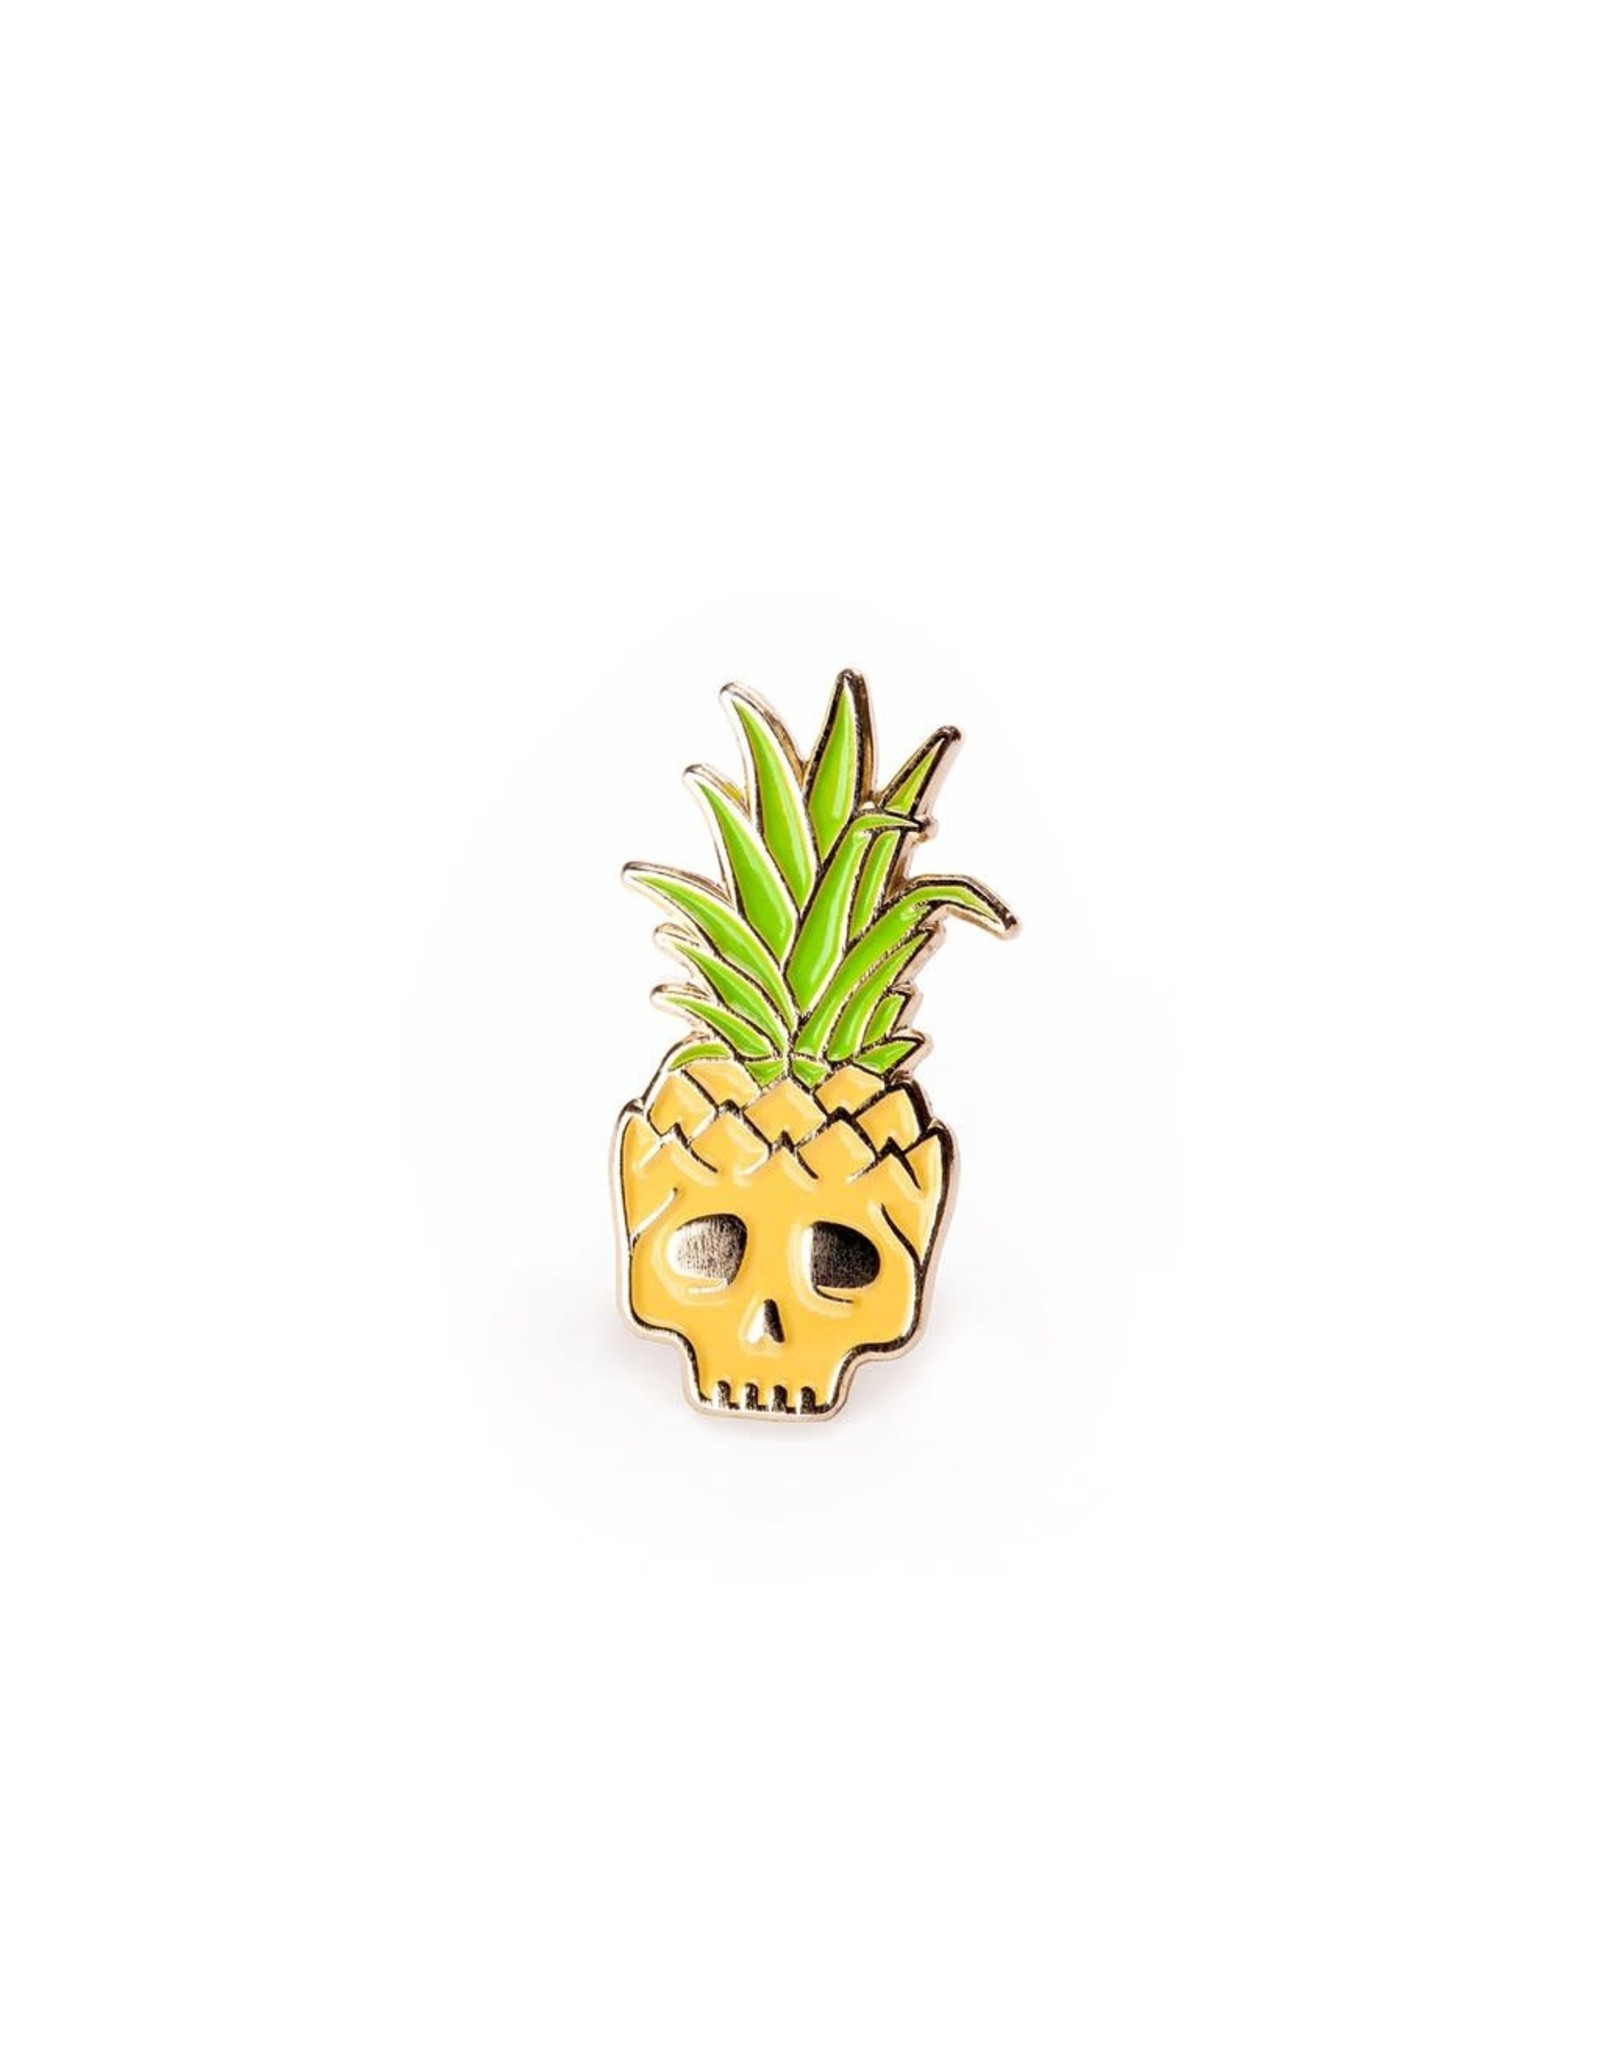 Enamel Pin Pineapple Skull Enamel Pin